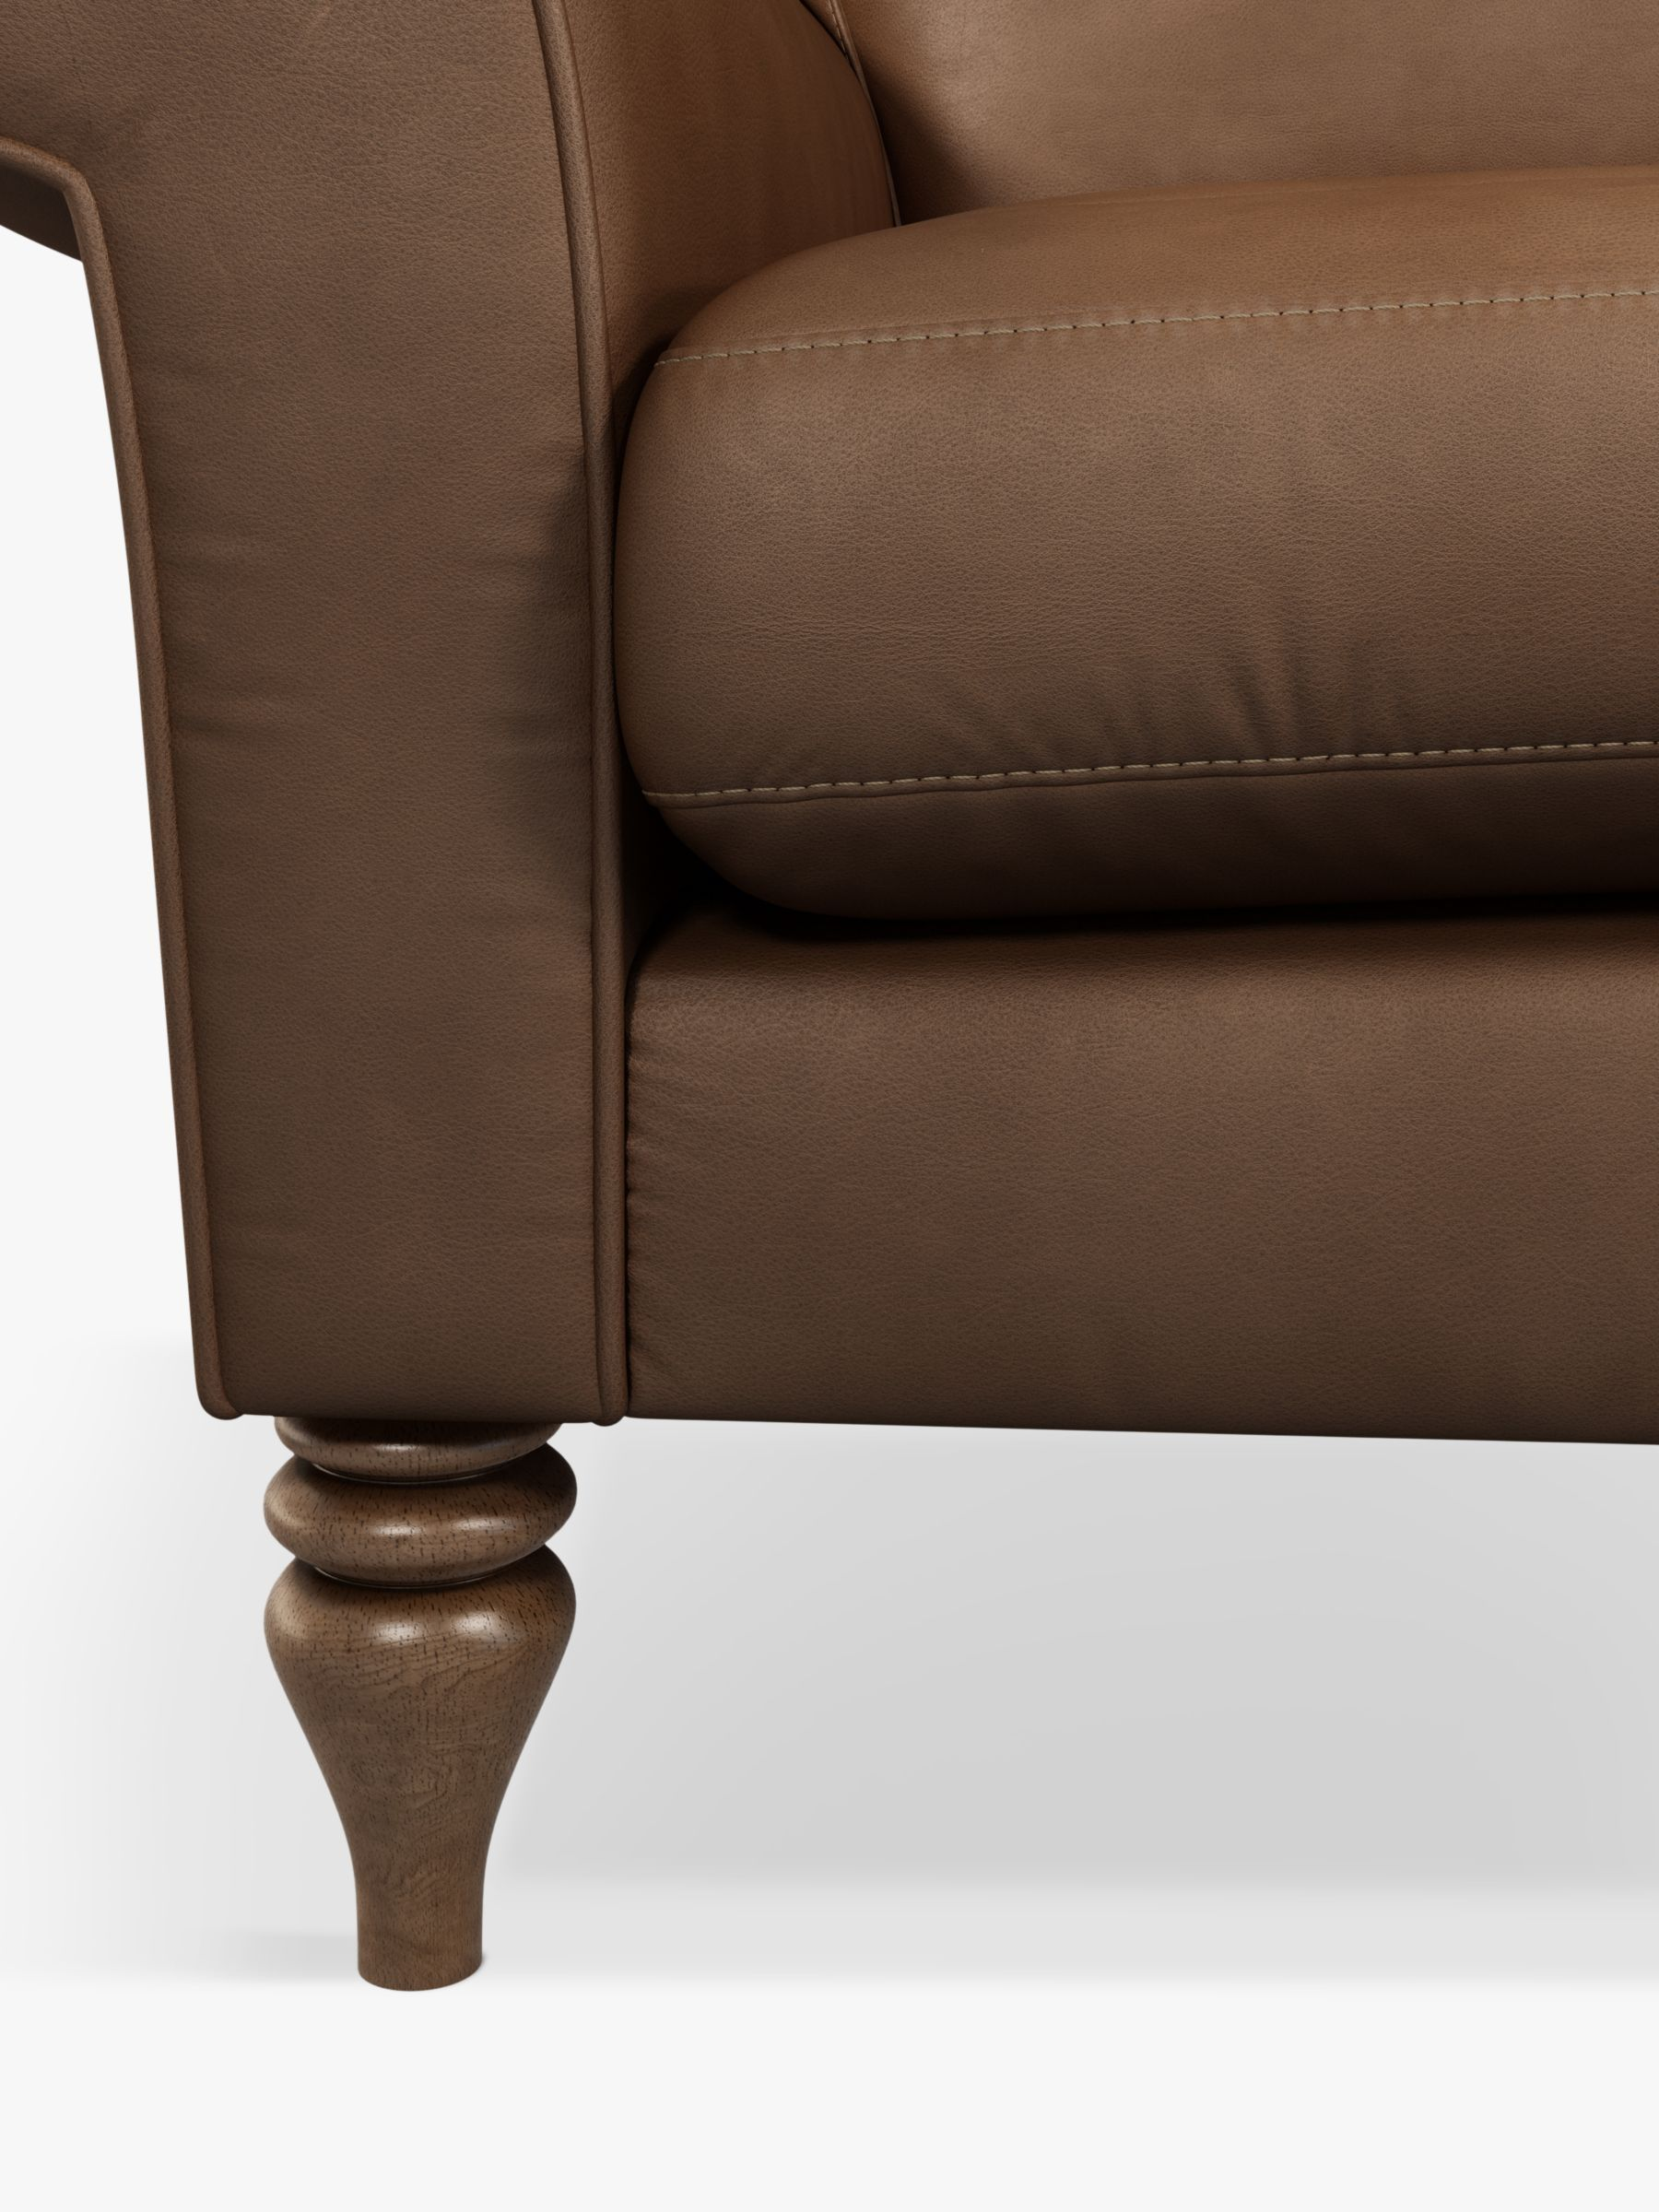 John Lewis Partners Camber Large 3 Seater Leather Sofa Dark Leg In 2020 Leather Sofa 3 Seater Leather Sofa Sofa